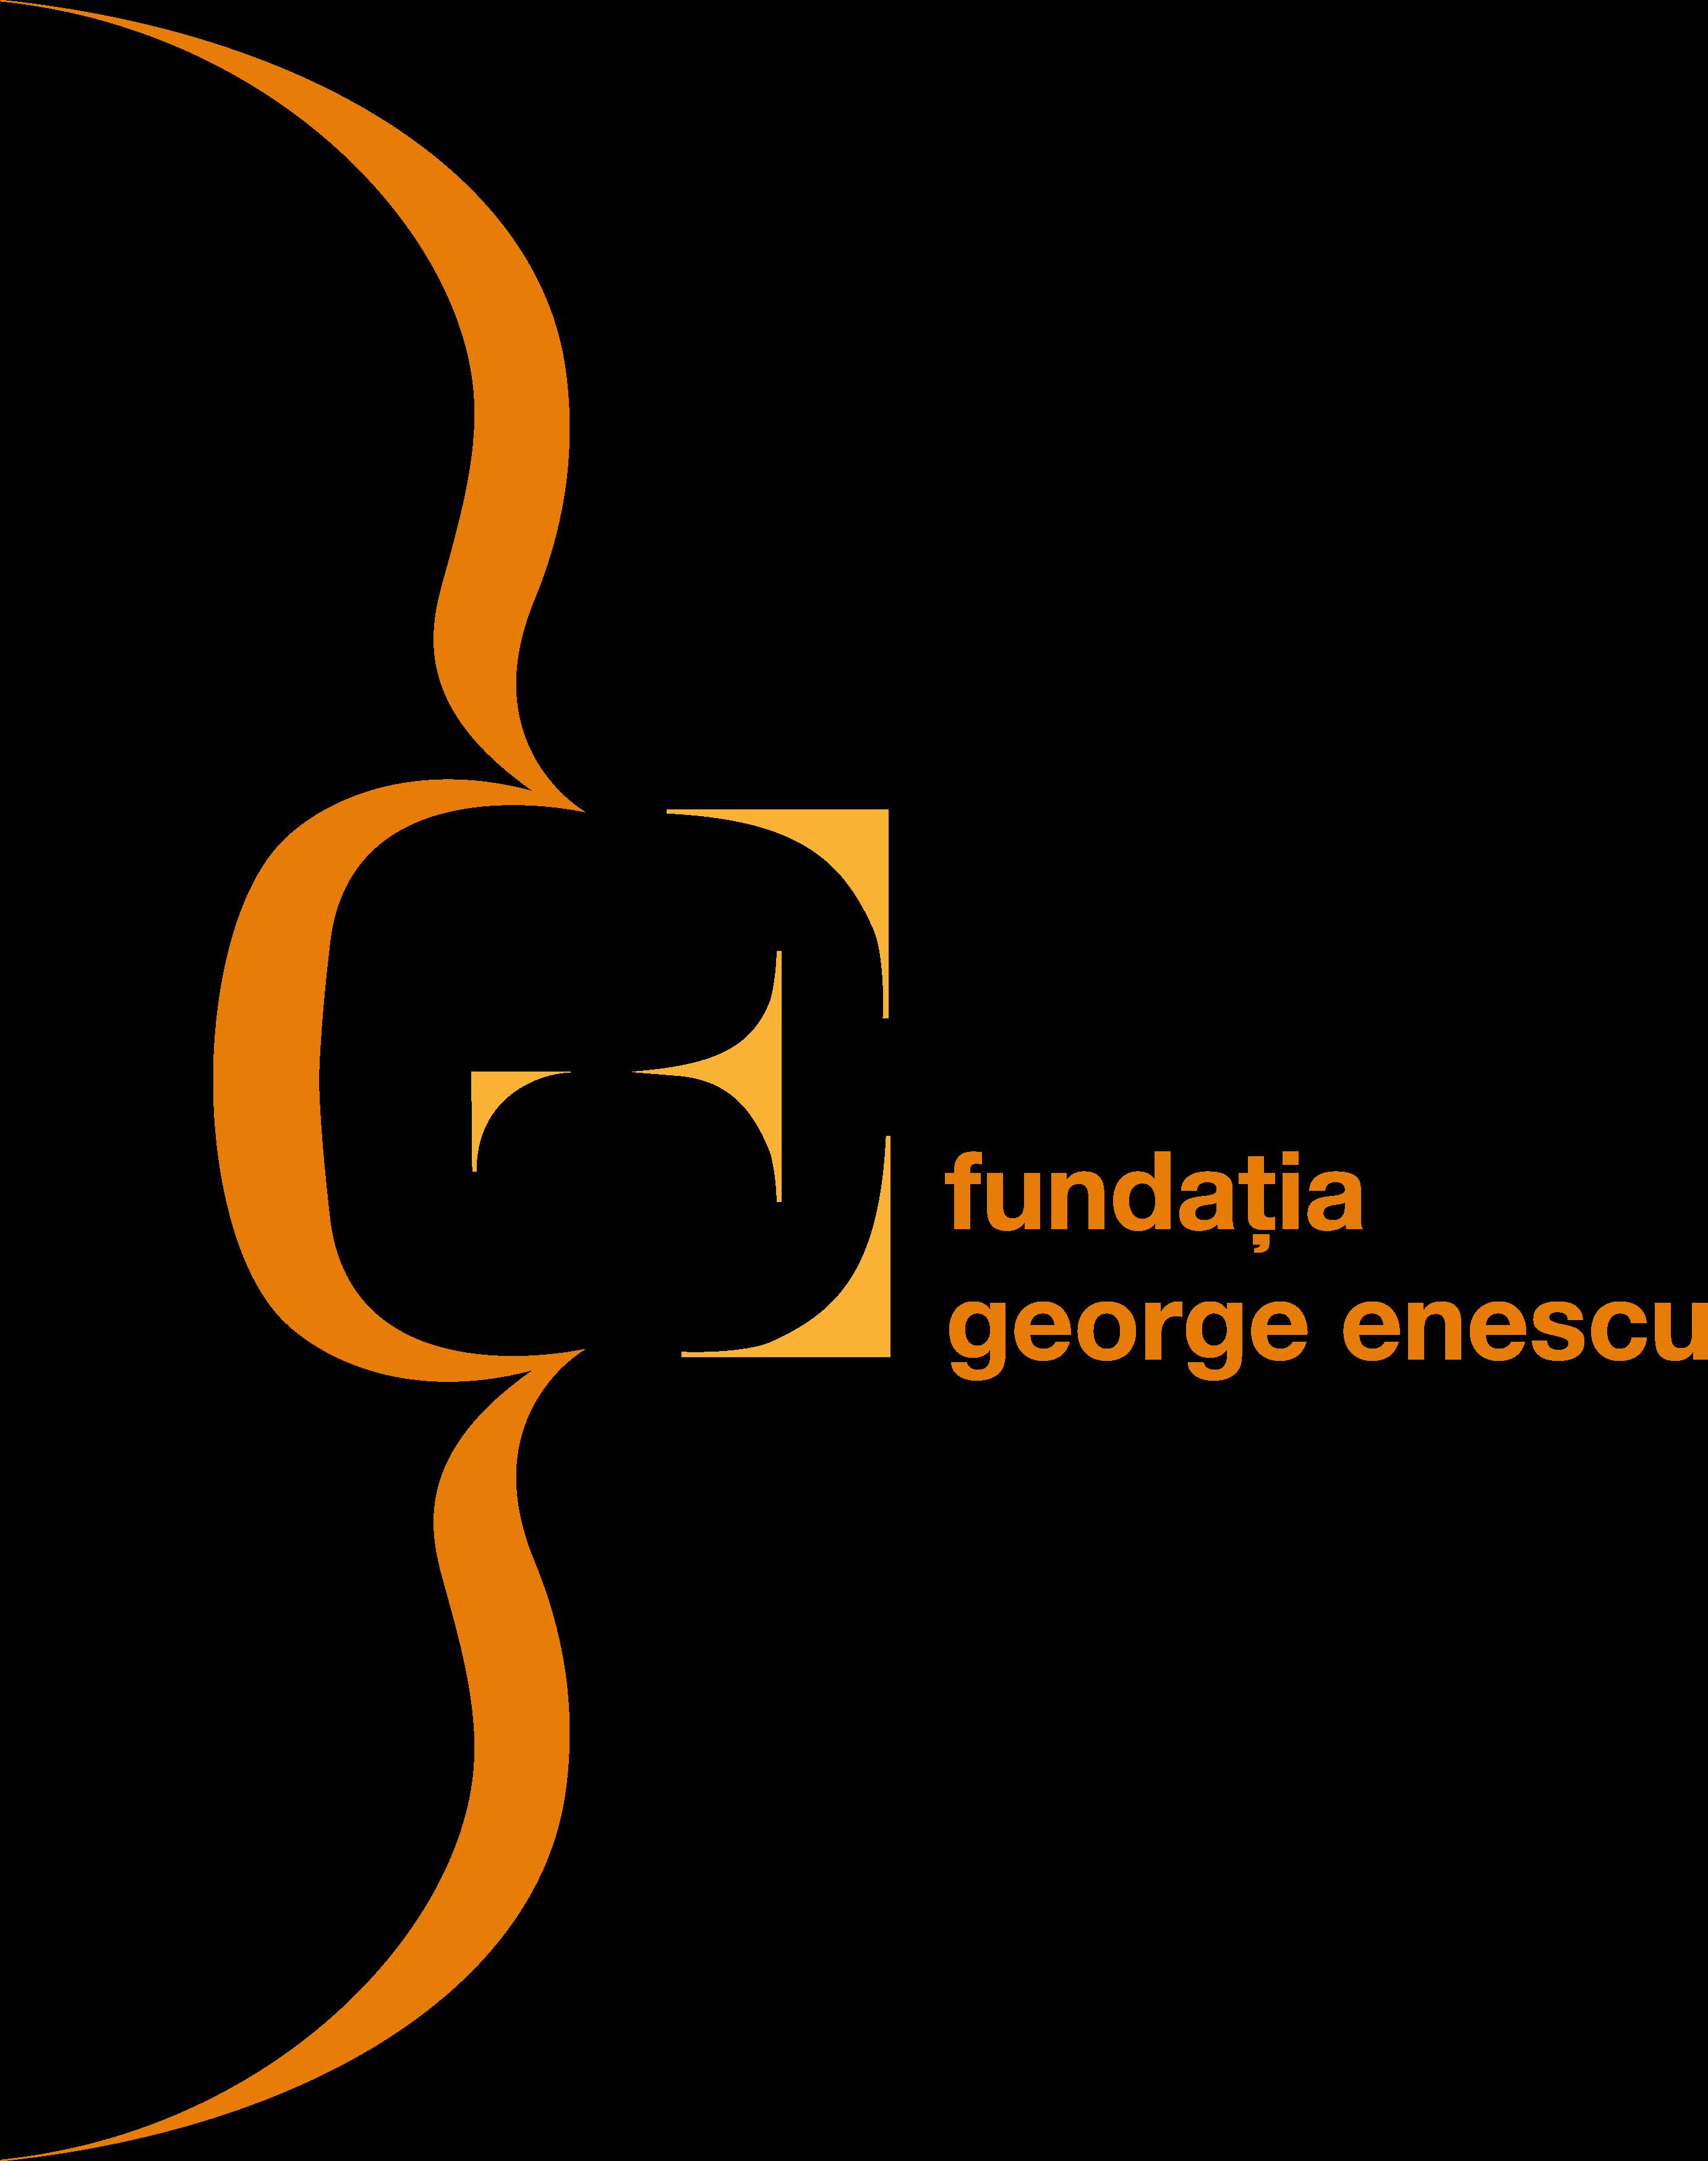 Fundatia George Enescu logo